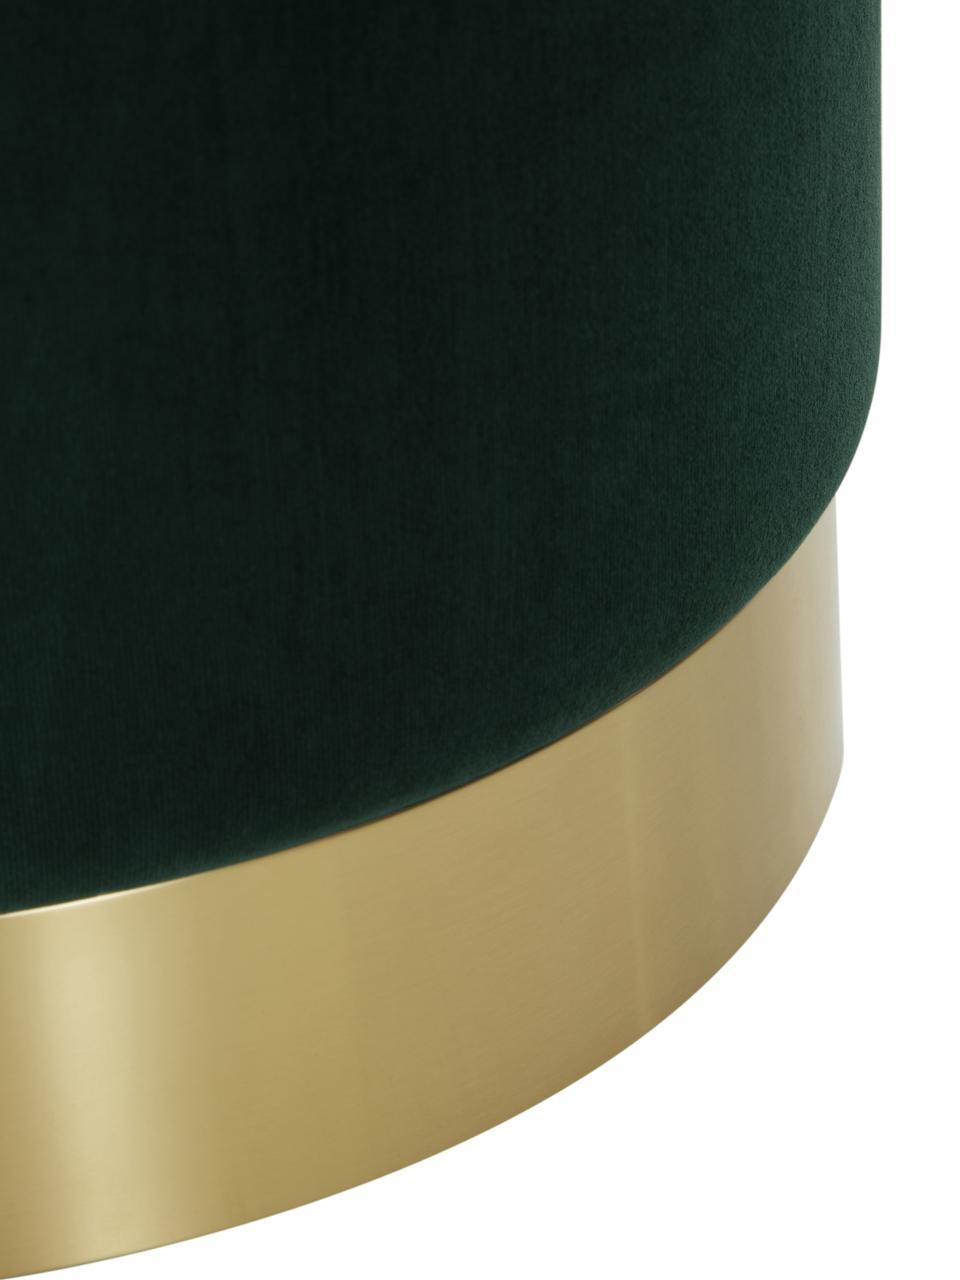 Samt-Hocker Orchid, Bezug: Samt (Polyester) Der hoch, Rahmen: Sperrholz, Bezug: Hellgrün. Fuß: Goldfarben, Ø 38 x H 38 cm